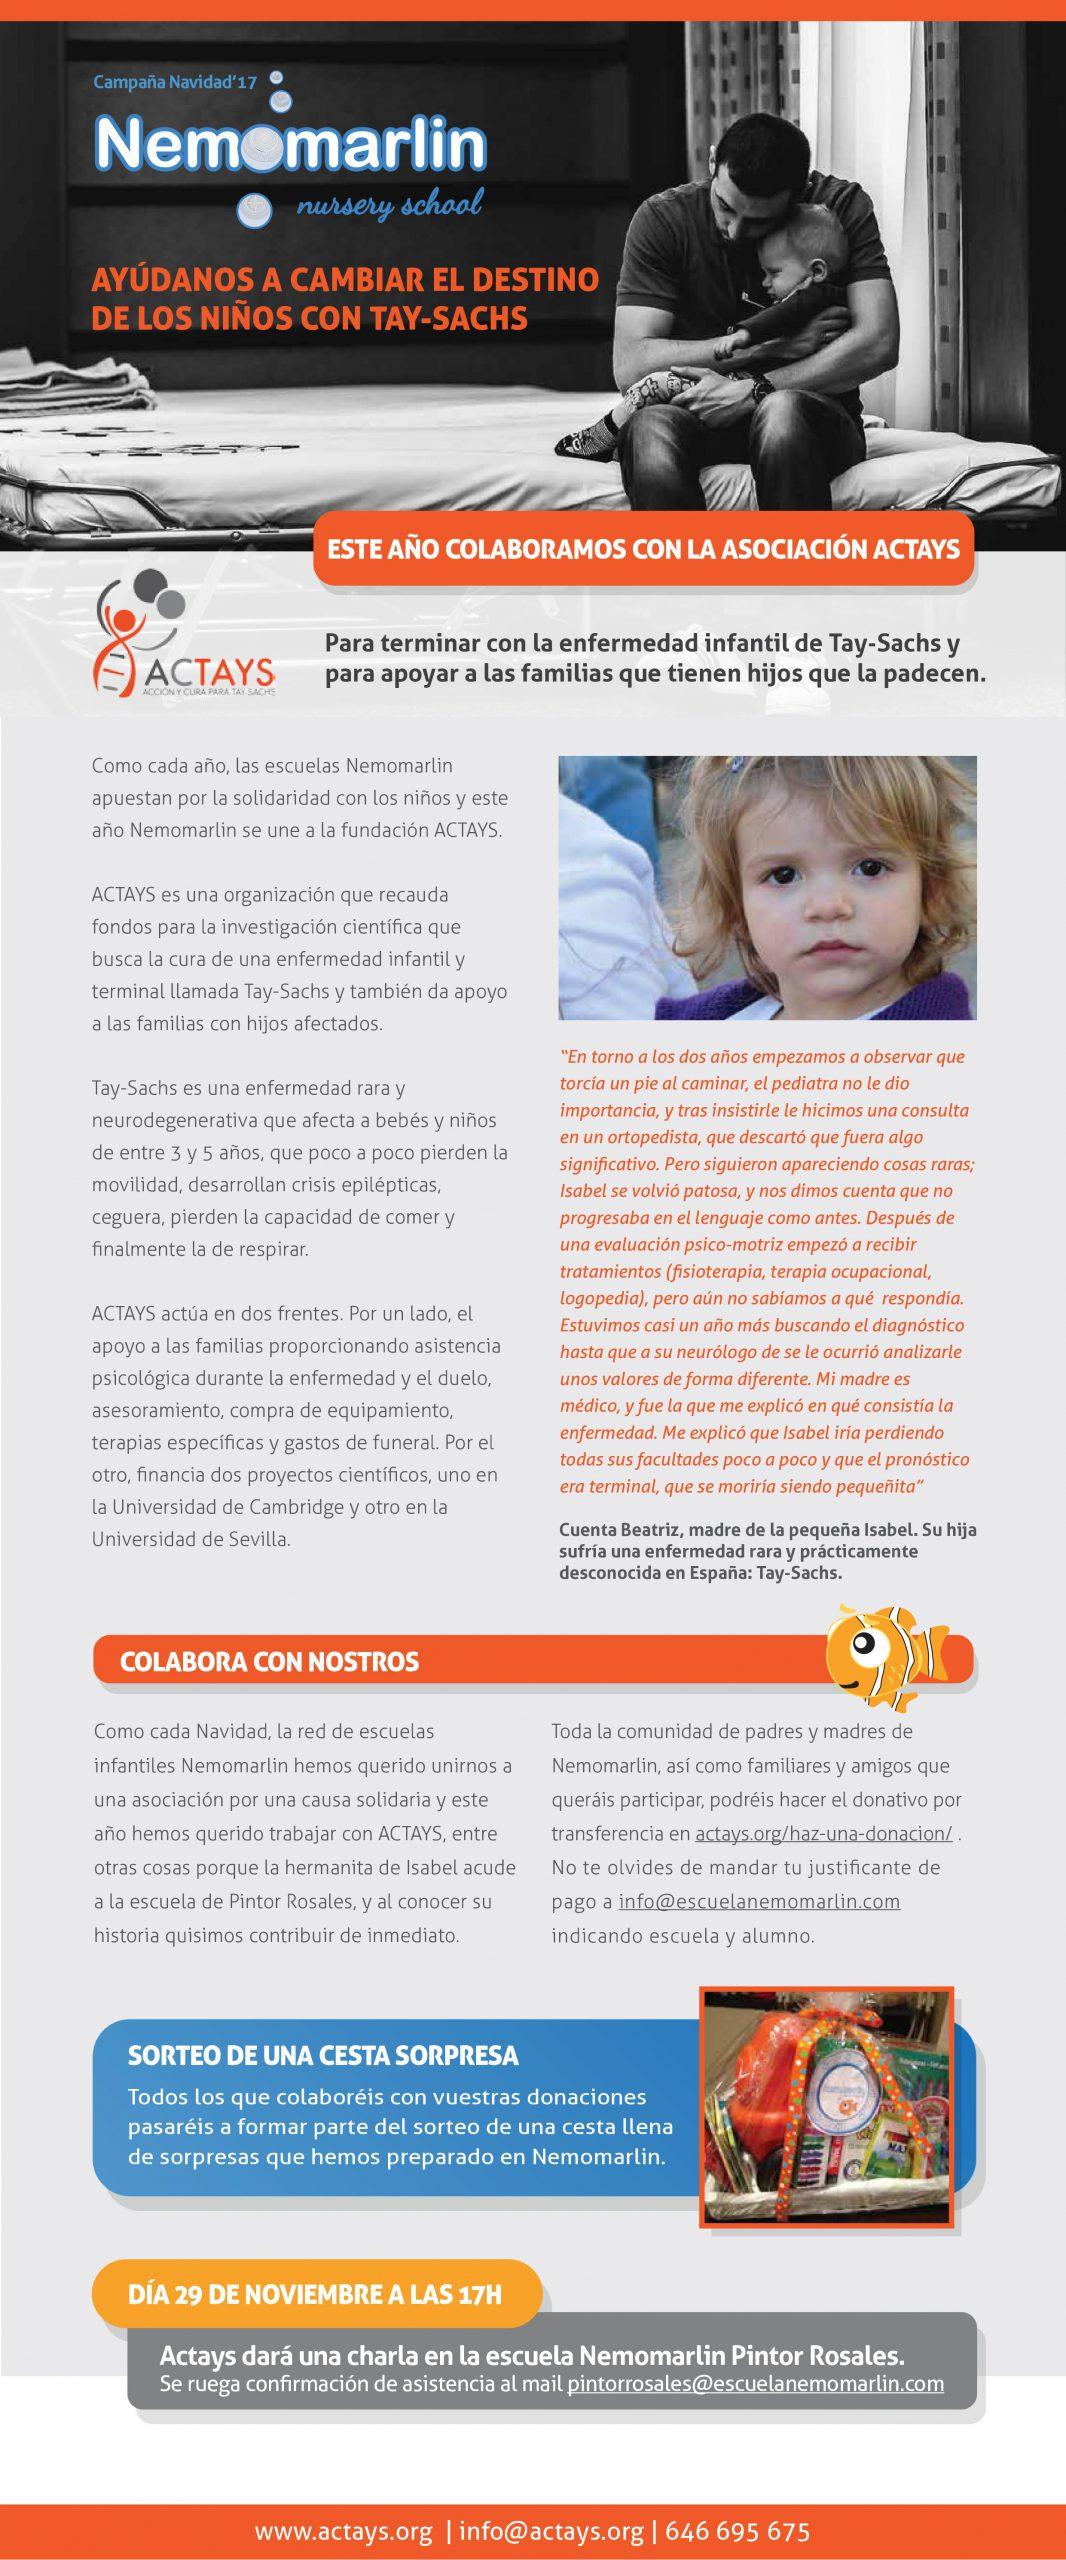 Colaboración escuelas Nemomarlin con asociación ACTAYS